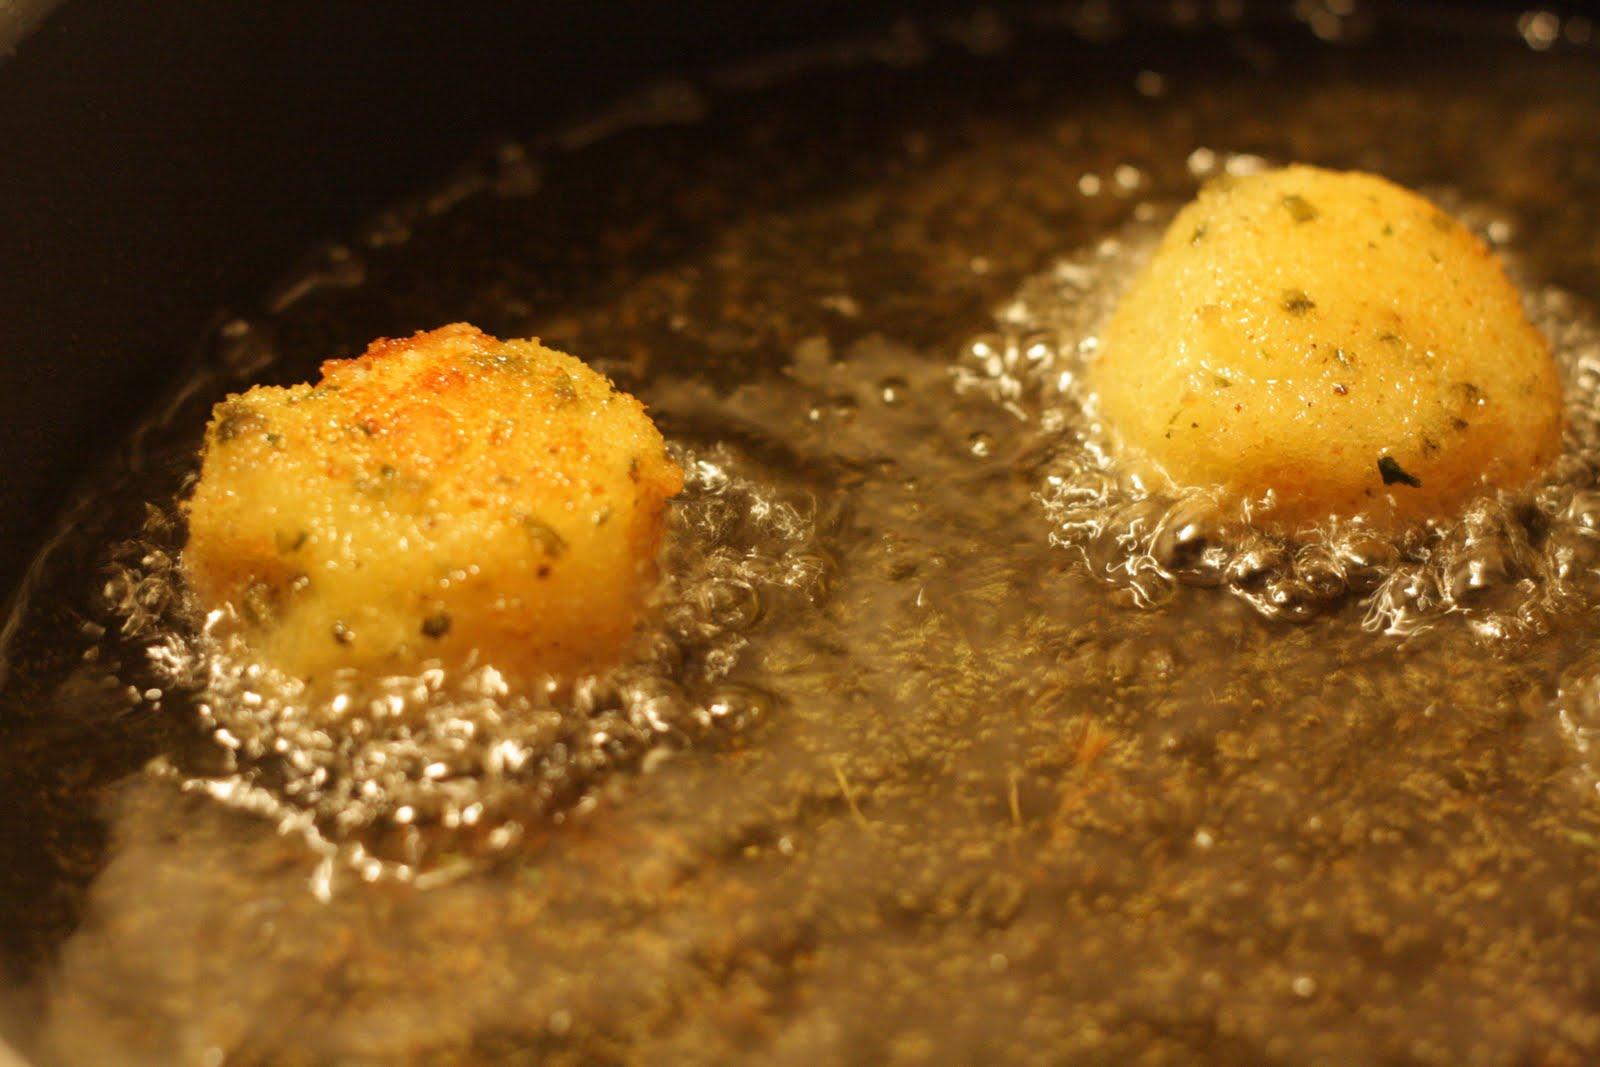 Quirks and Smirks: Fried German Dumplings